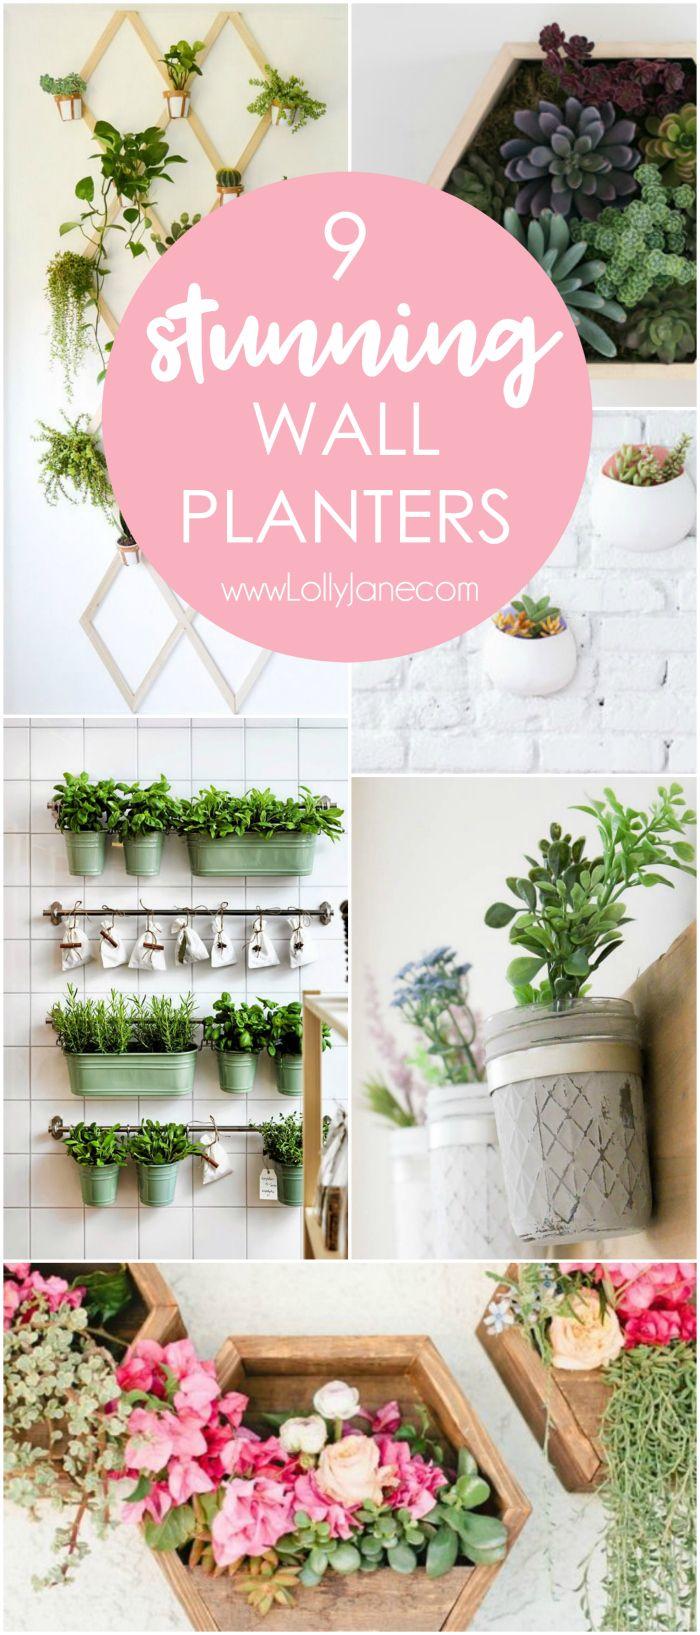 9 stunning wall planters